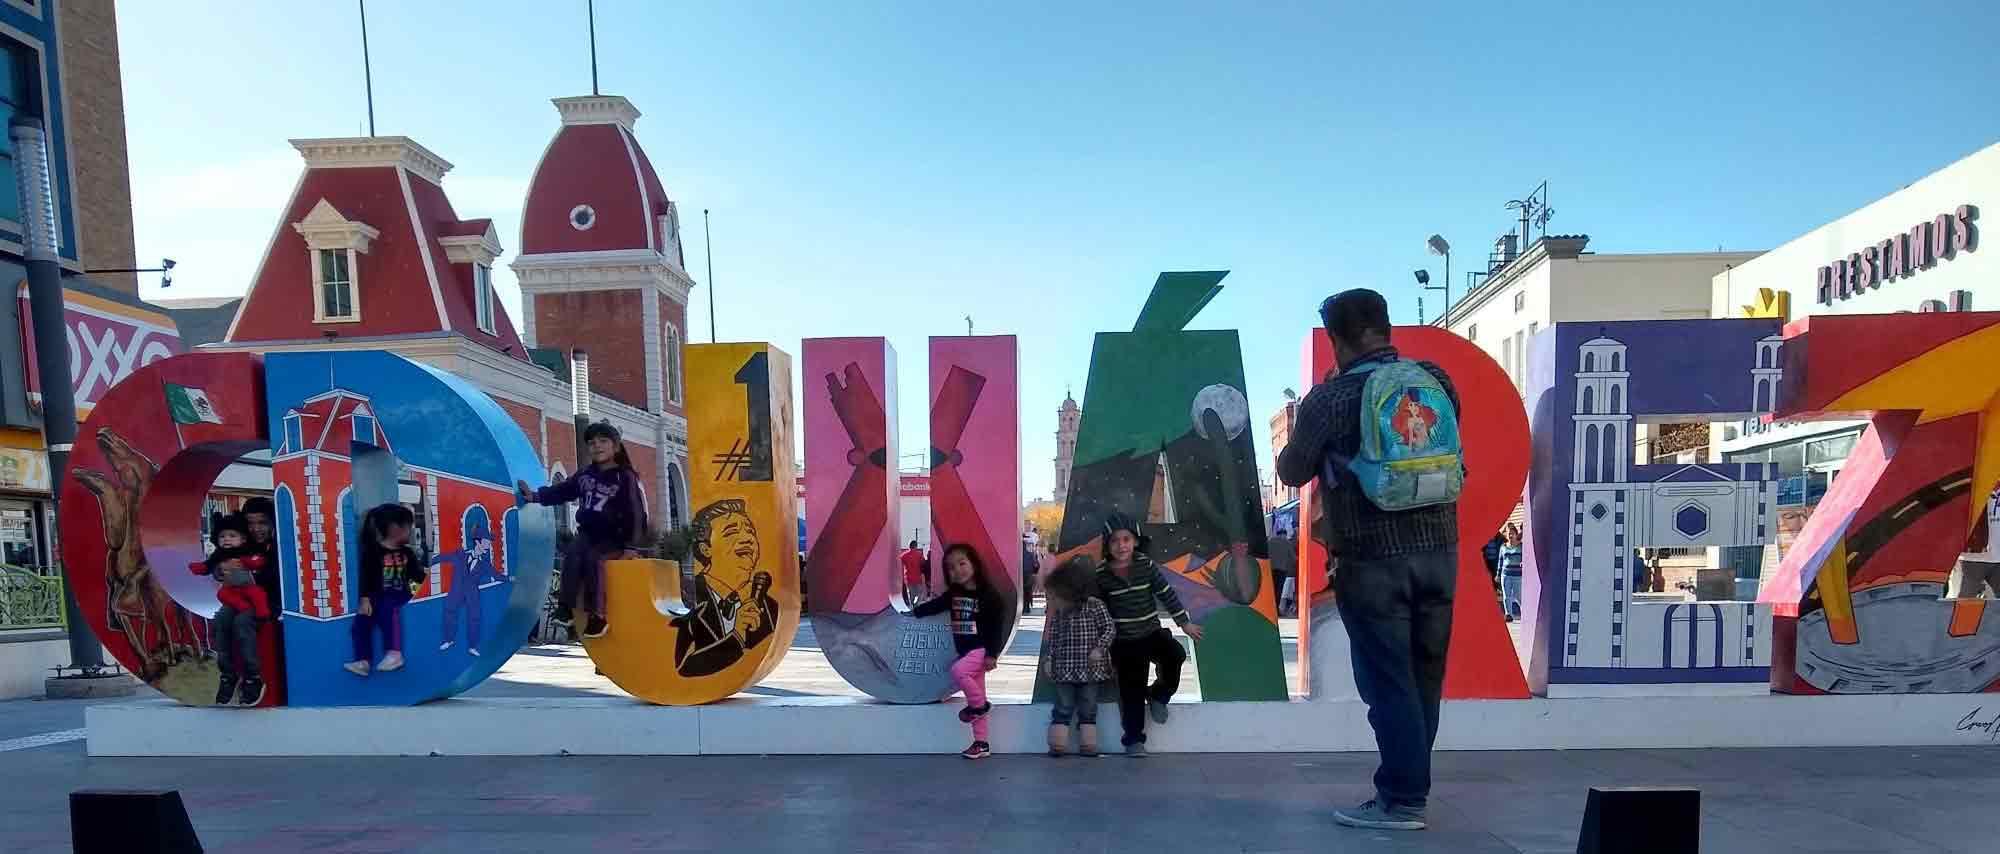 Ciudad Juárez – Photograph: lisa nevada